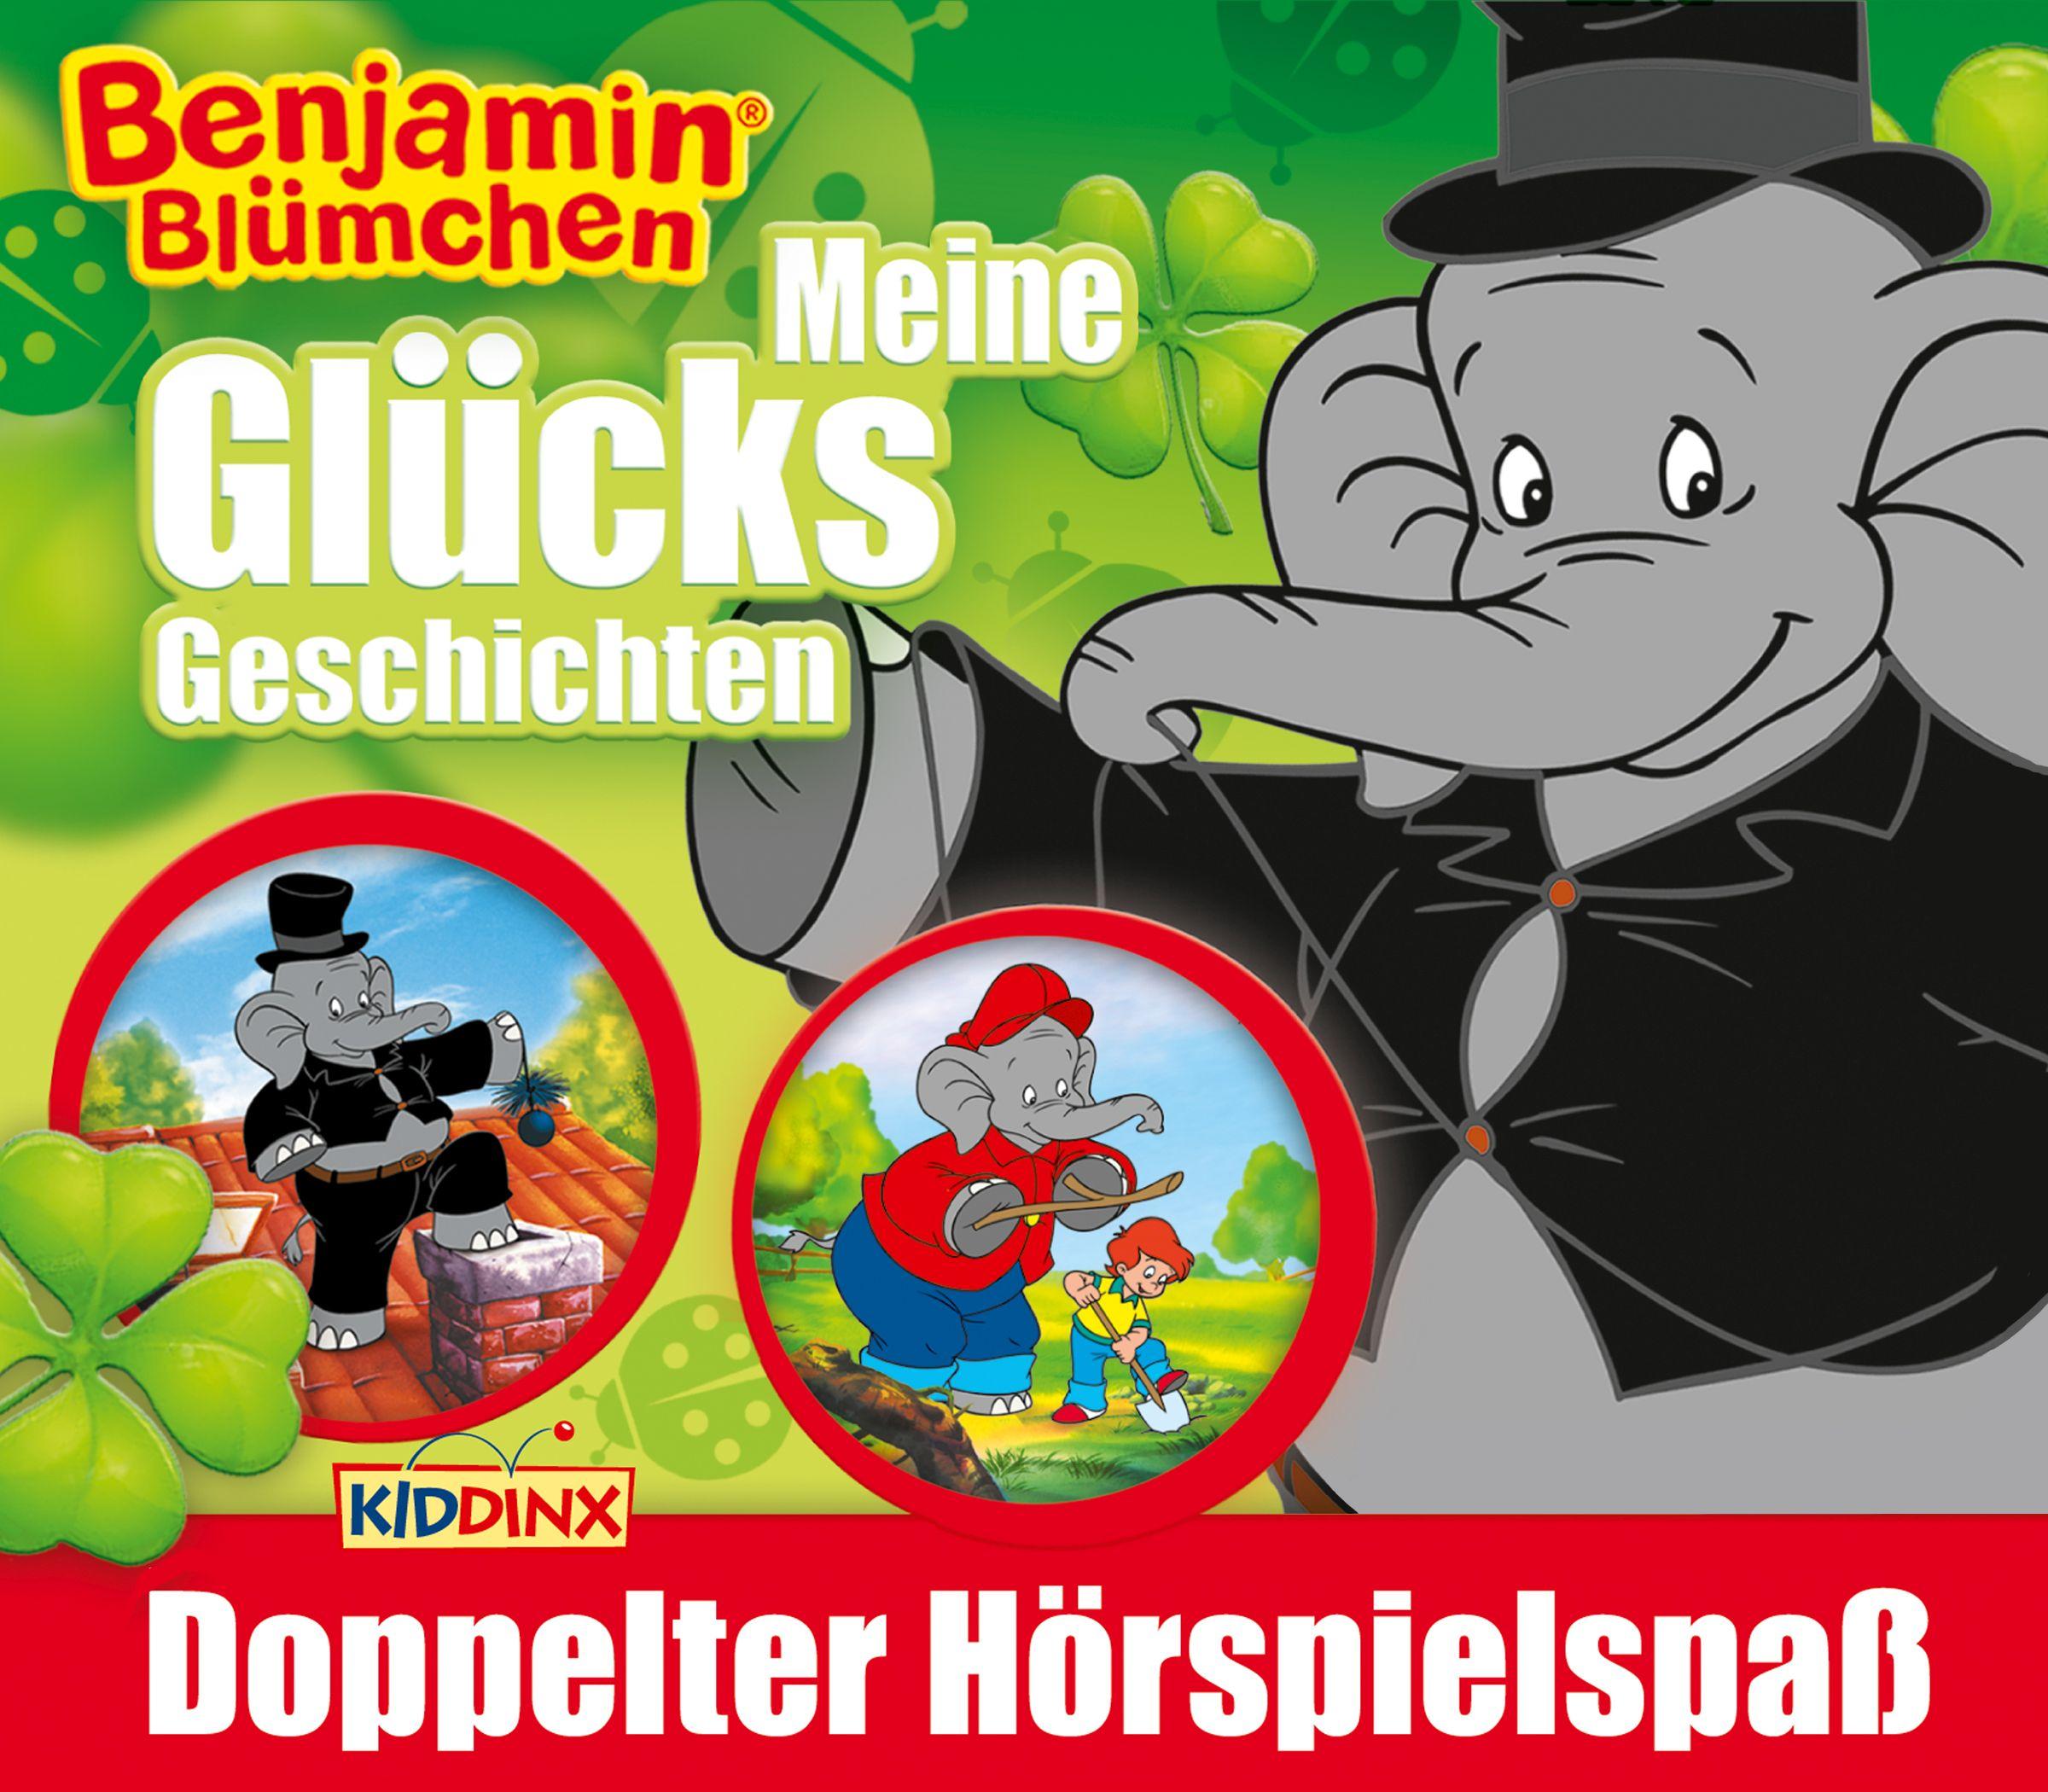 Benjamin Blümchen: 2er MP3-Download (Glücks-Ges...